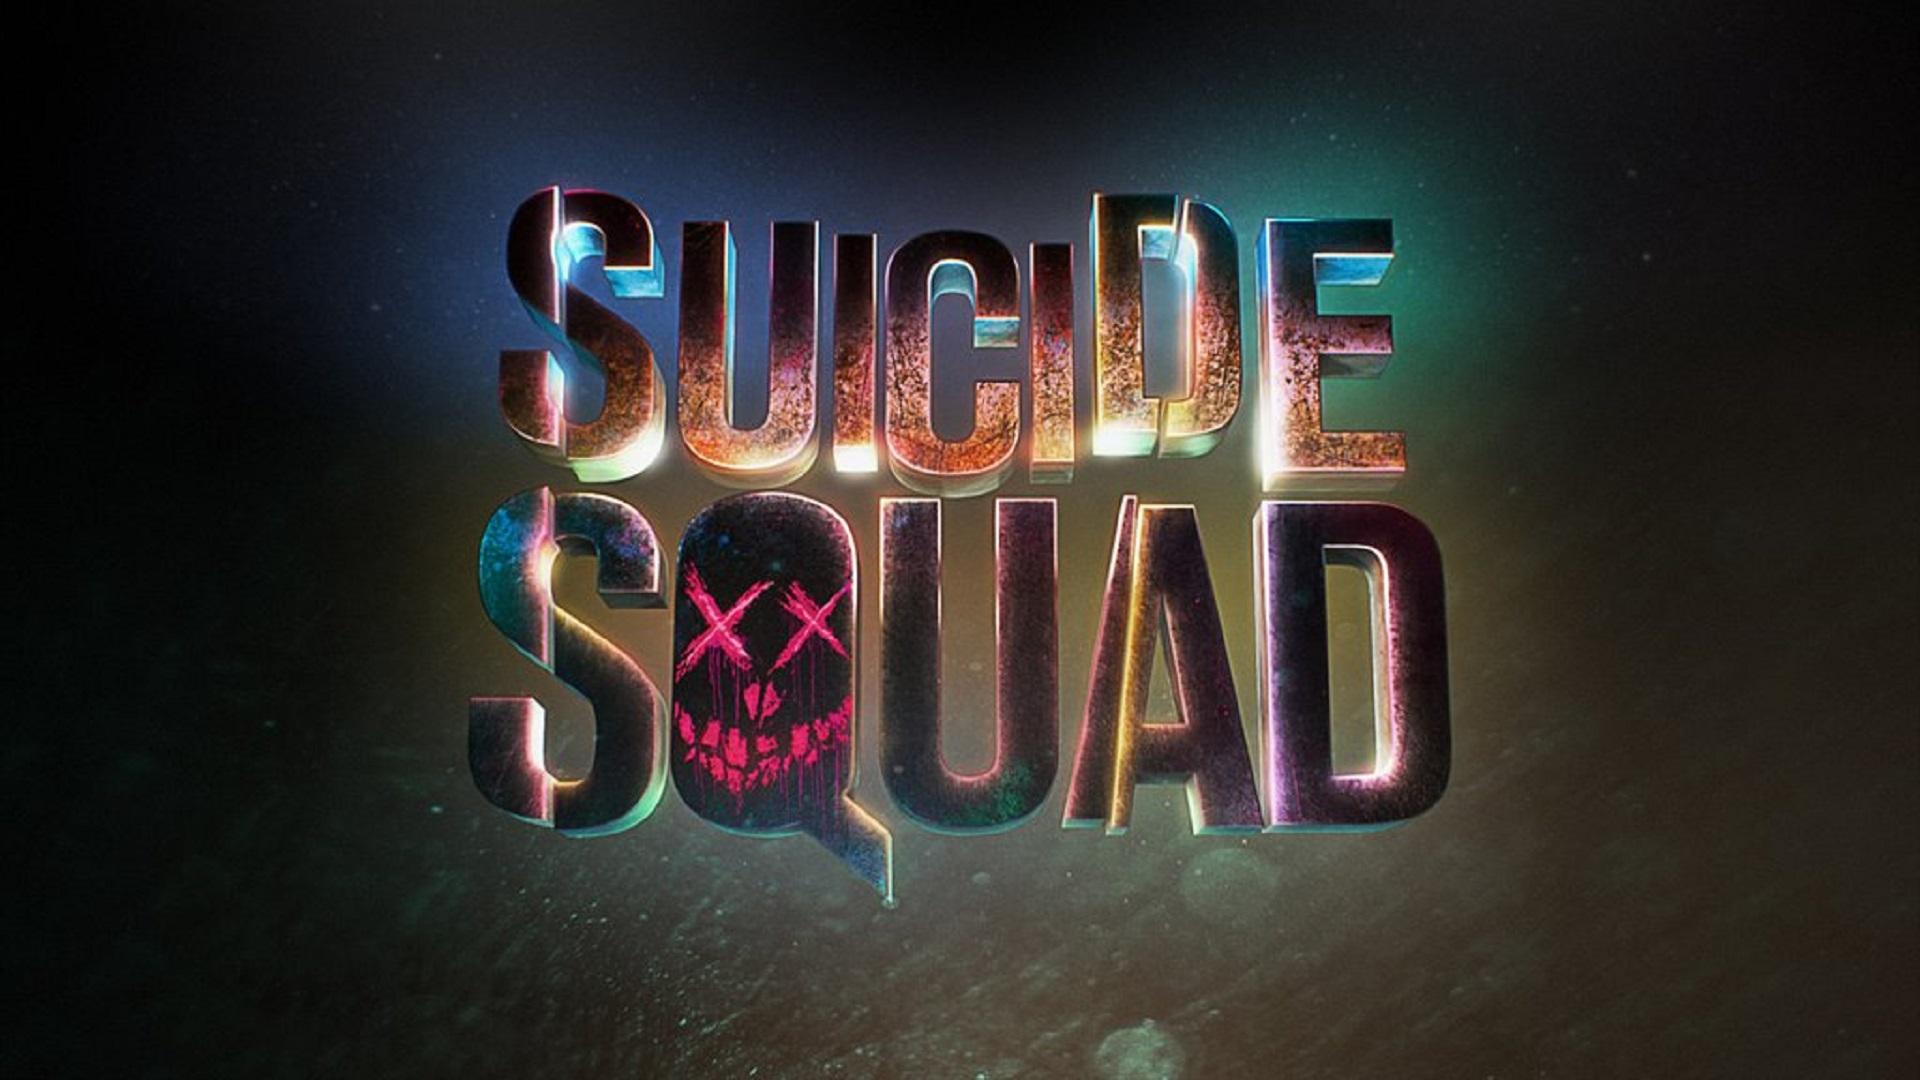 Suicide Squad wallpaper 3 1920x1080